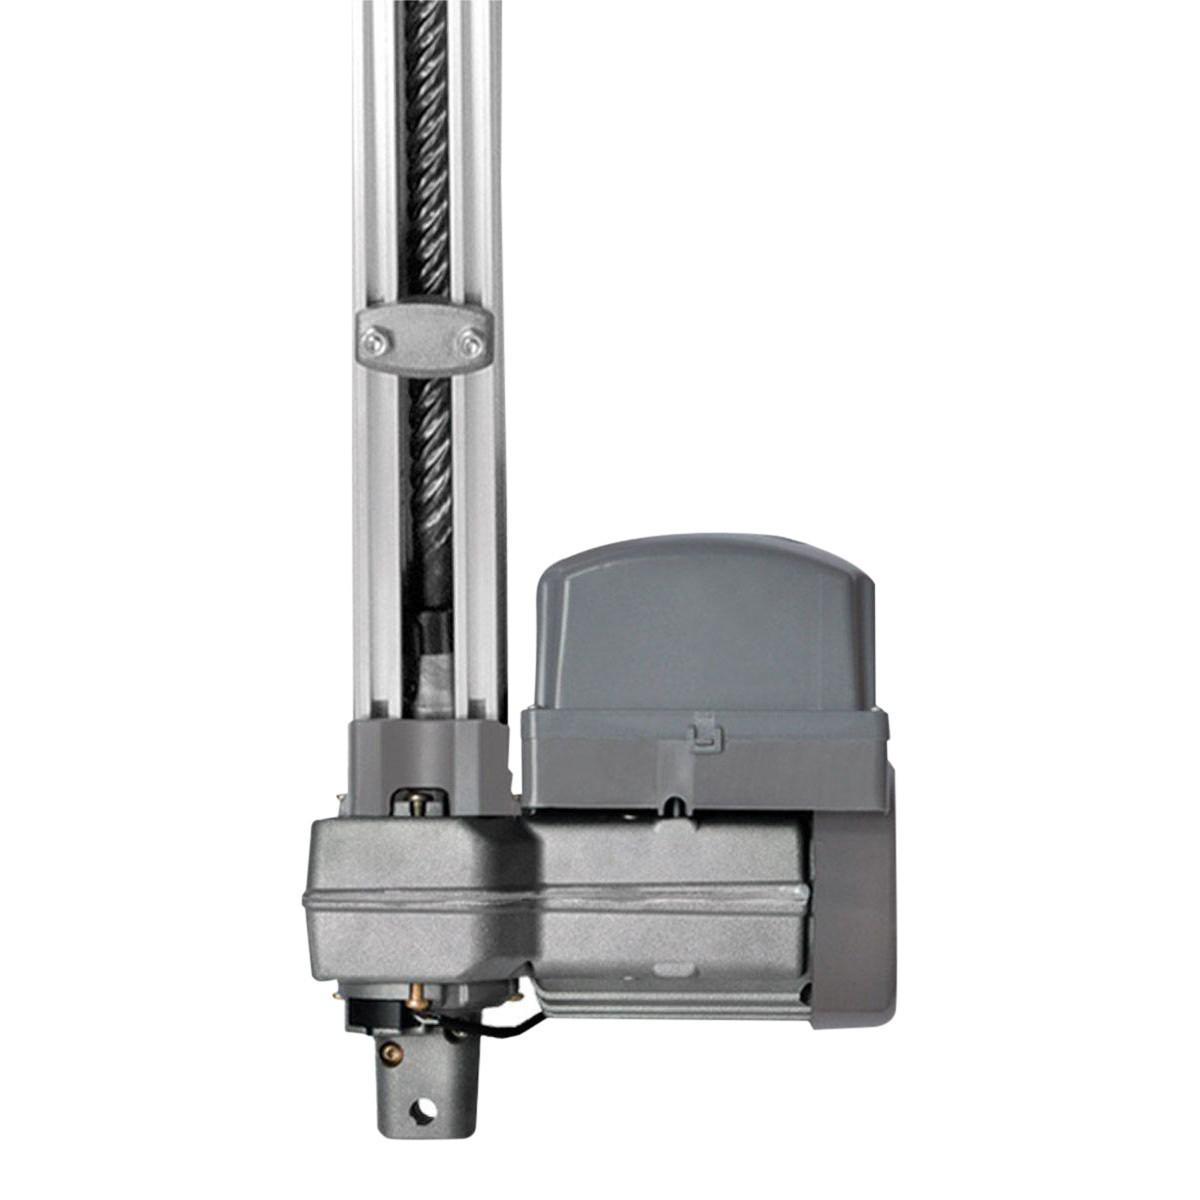 motor-automatizadorbv-potenza-predial-sp-ppa-1-15m-para-portao-basculante